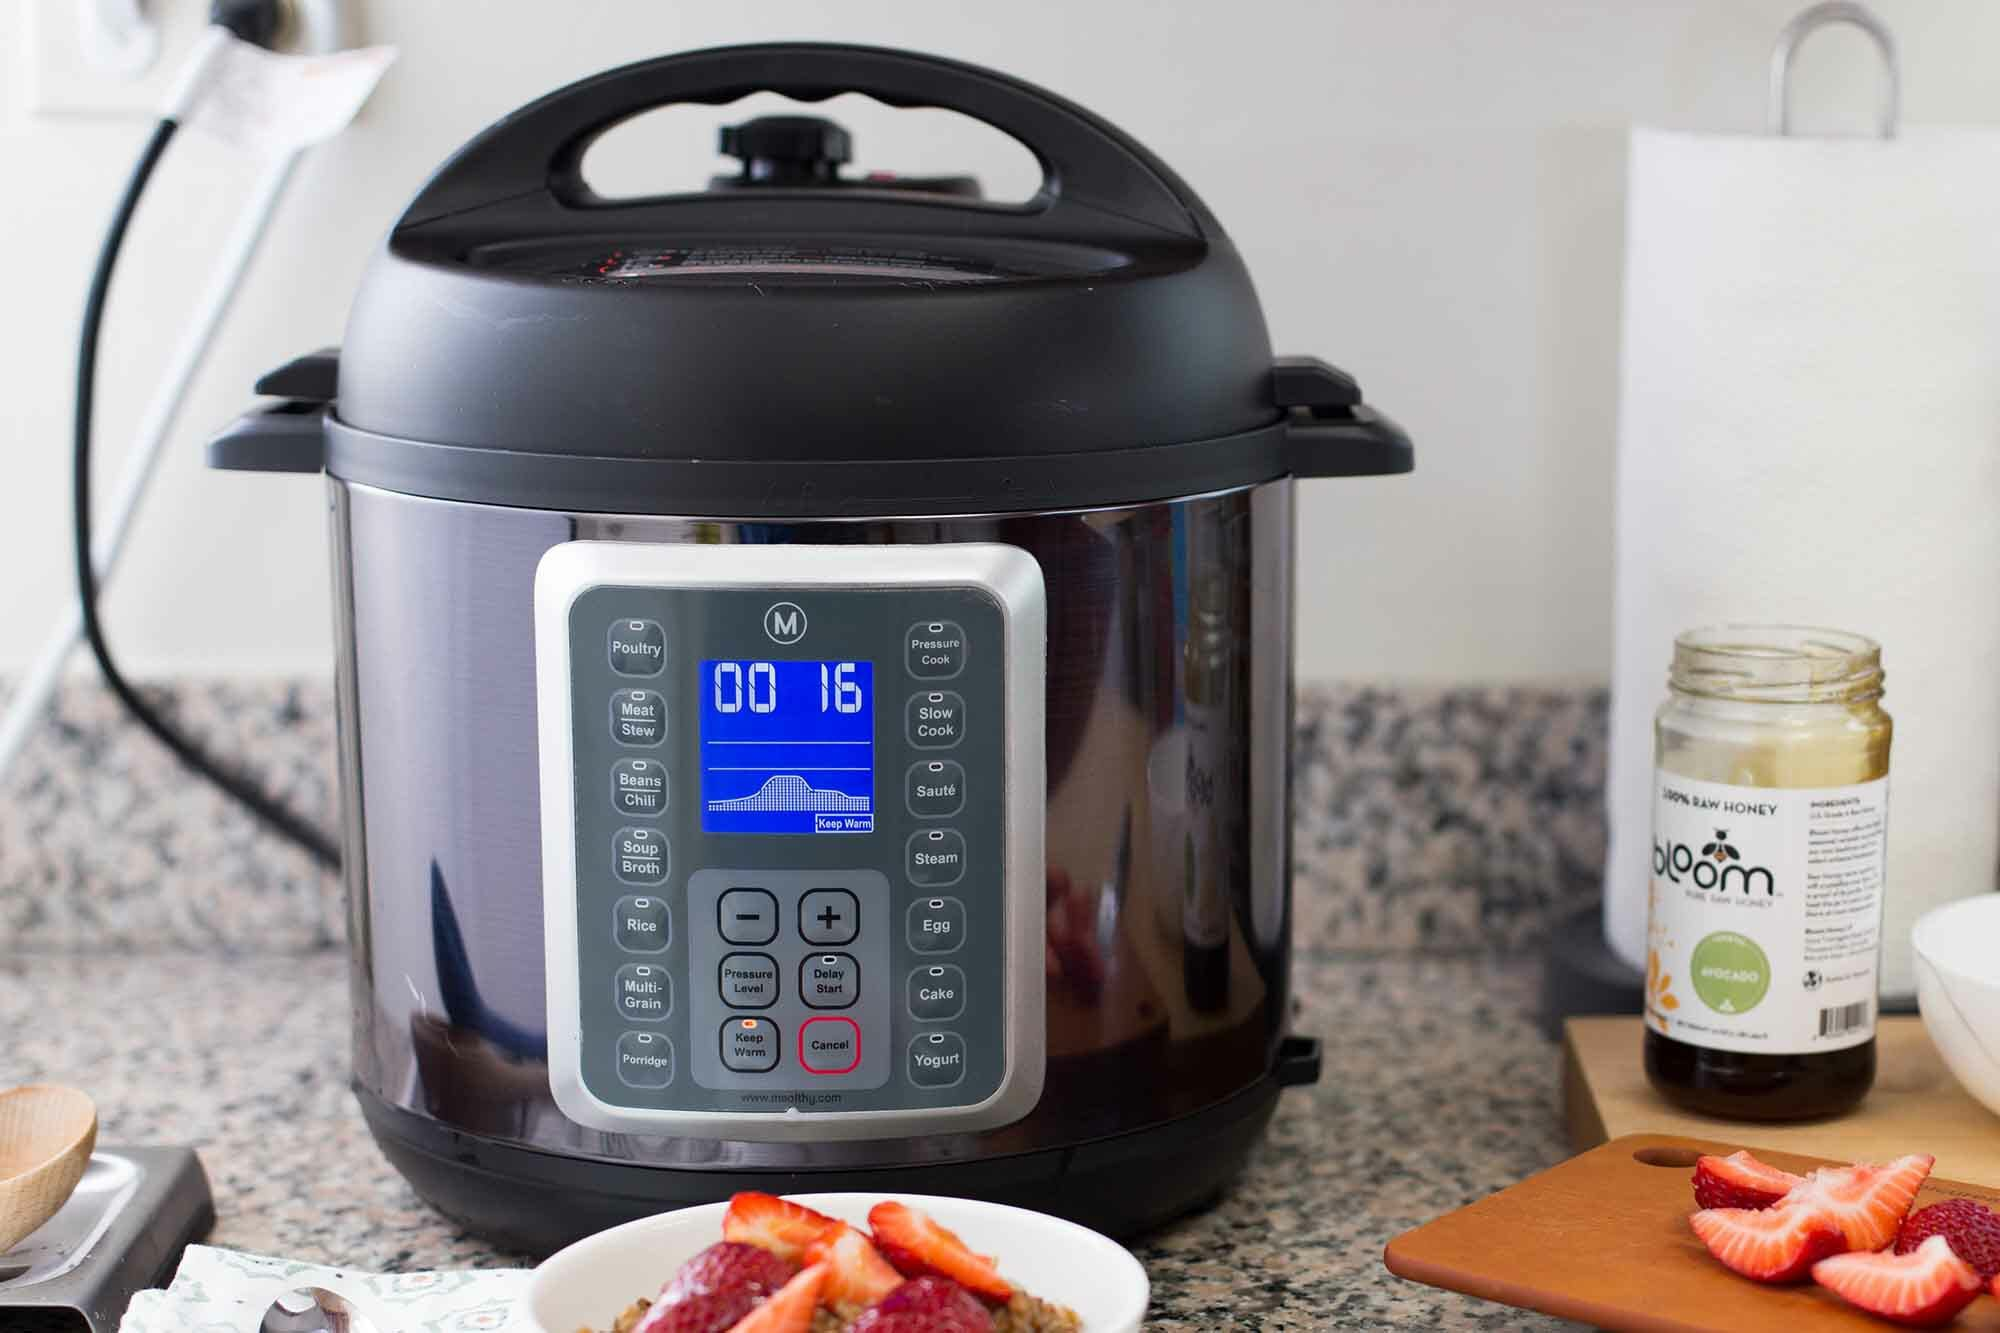 Convert Slow Cooker to Pressure Cooker